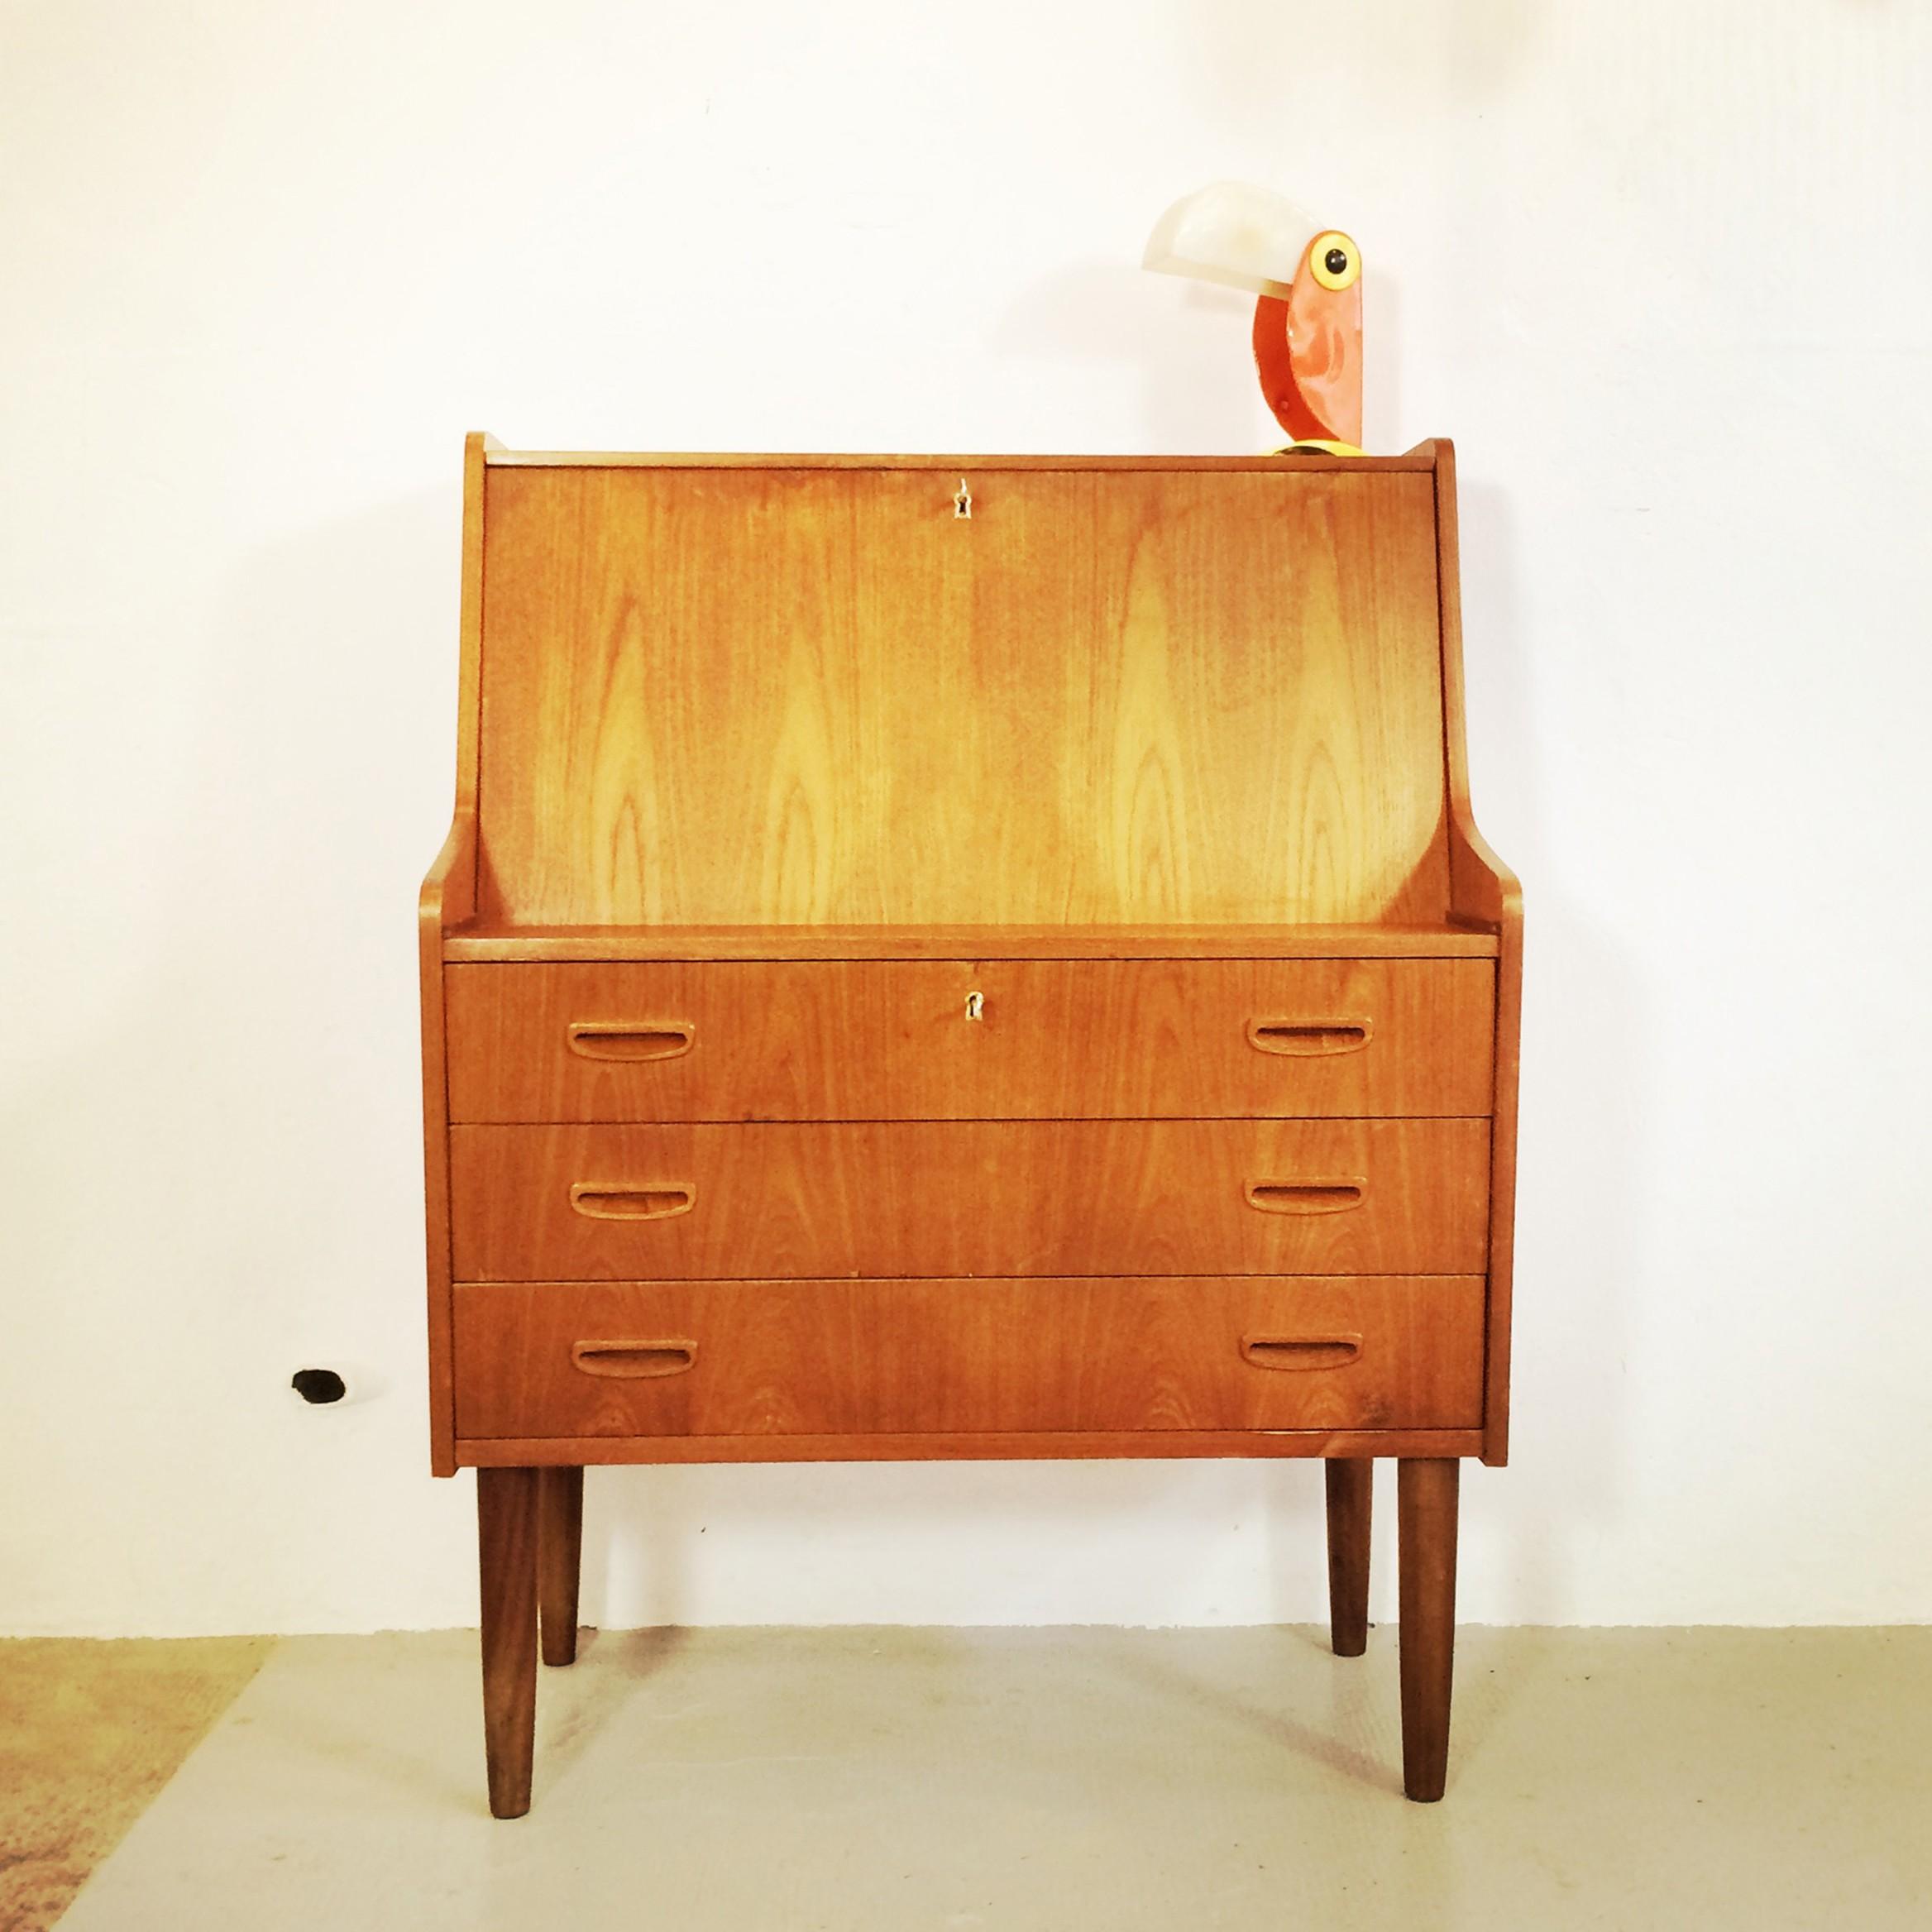 Scandinavian Secretary Desk Light Wood With 3 Drawers 1960s Previous Next